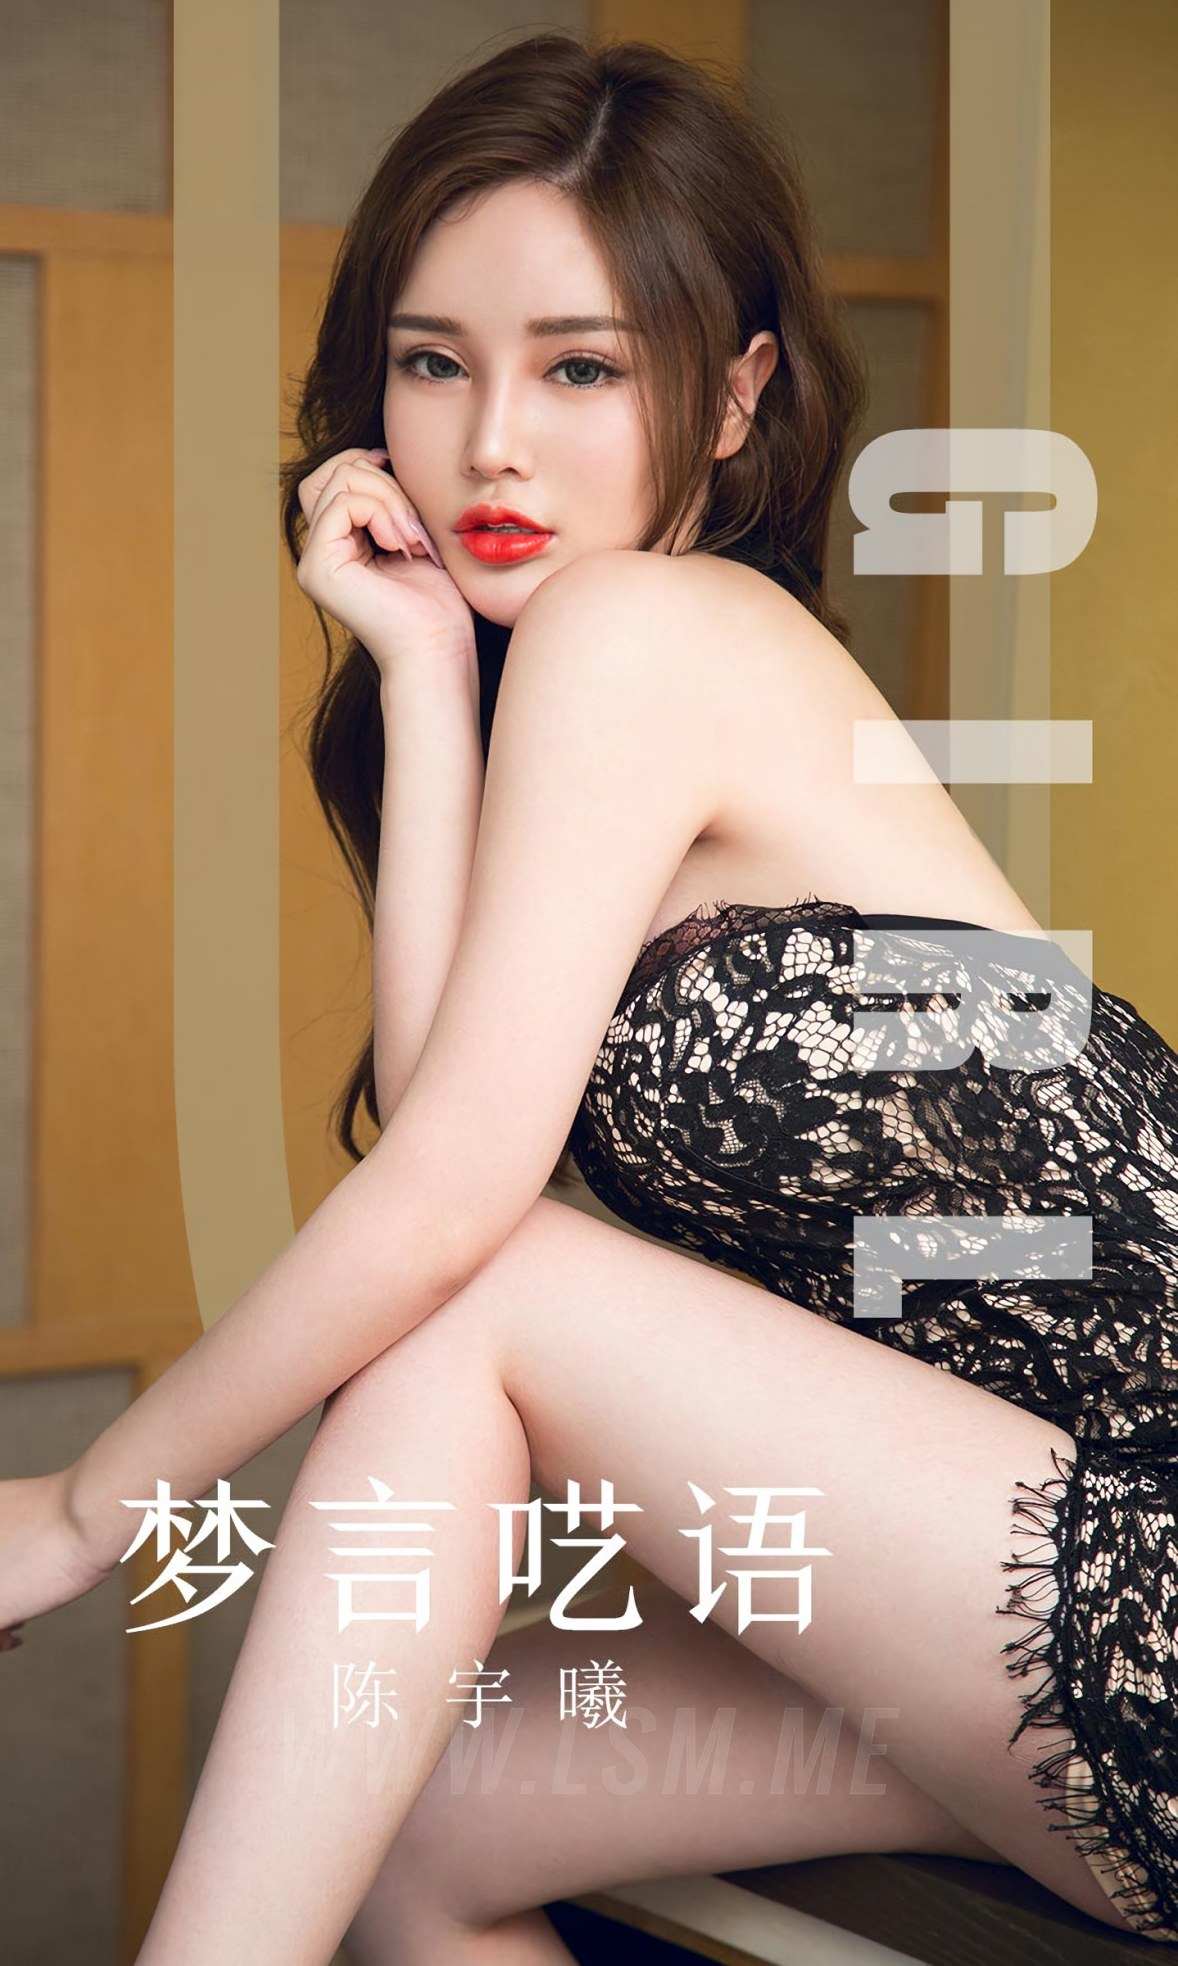 UGirls 爱尤物 No.1601 陈宇曦 红唇美女 - 1